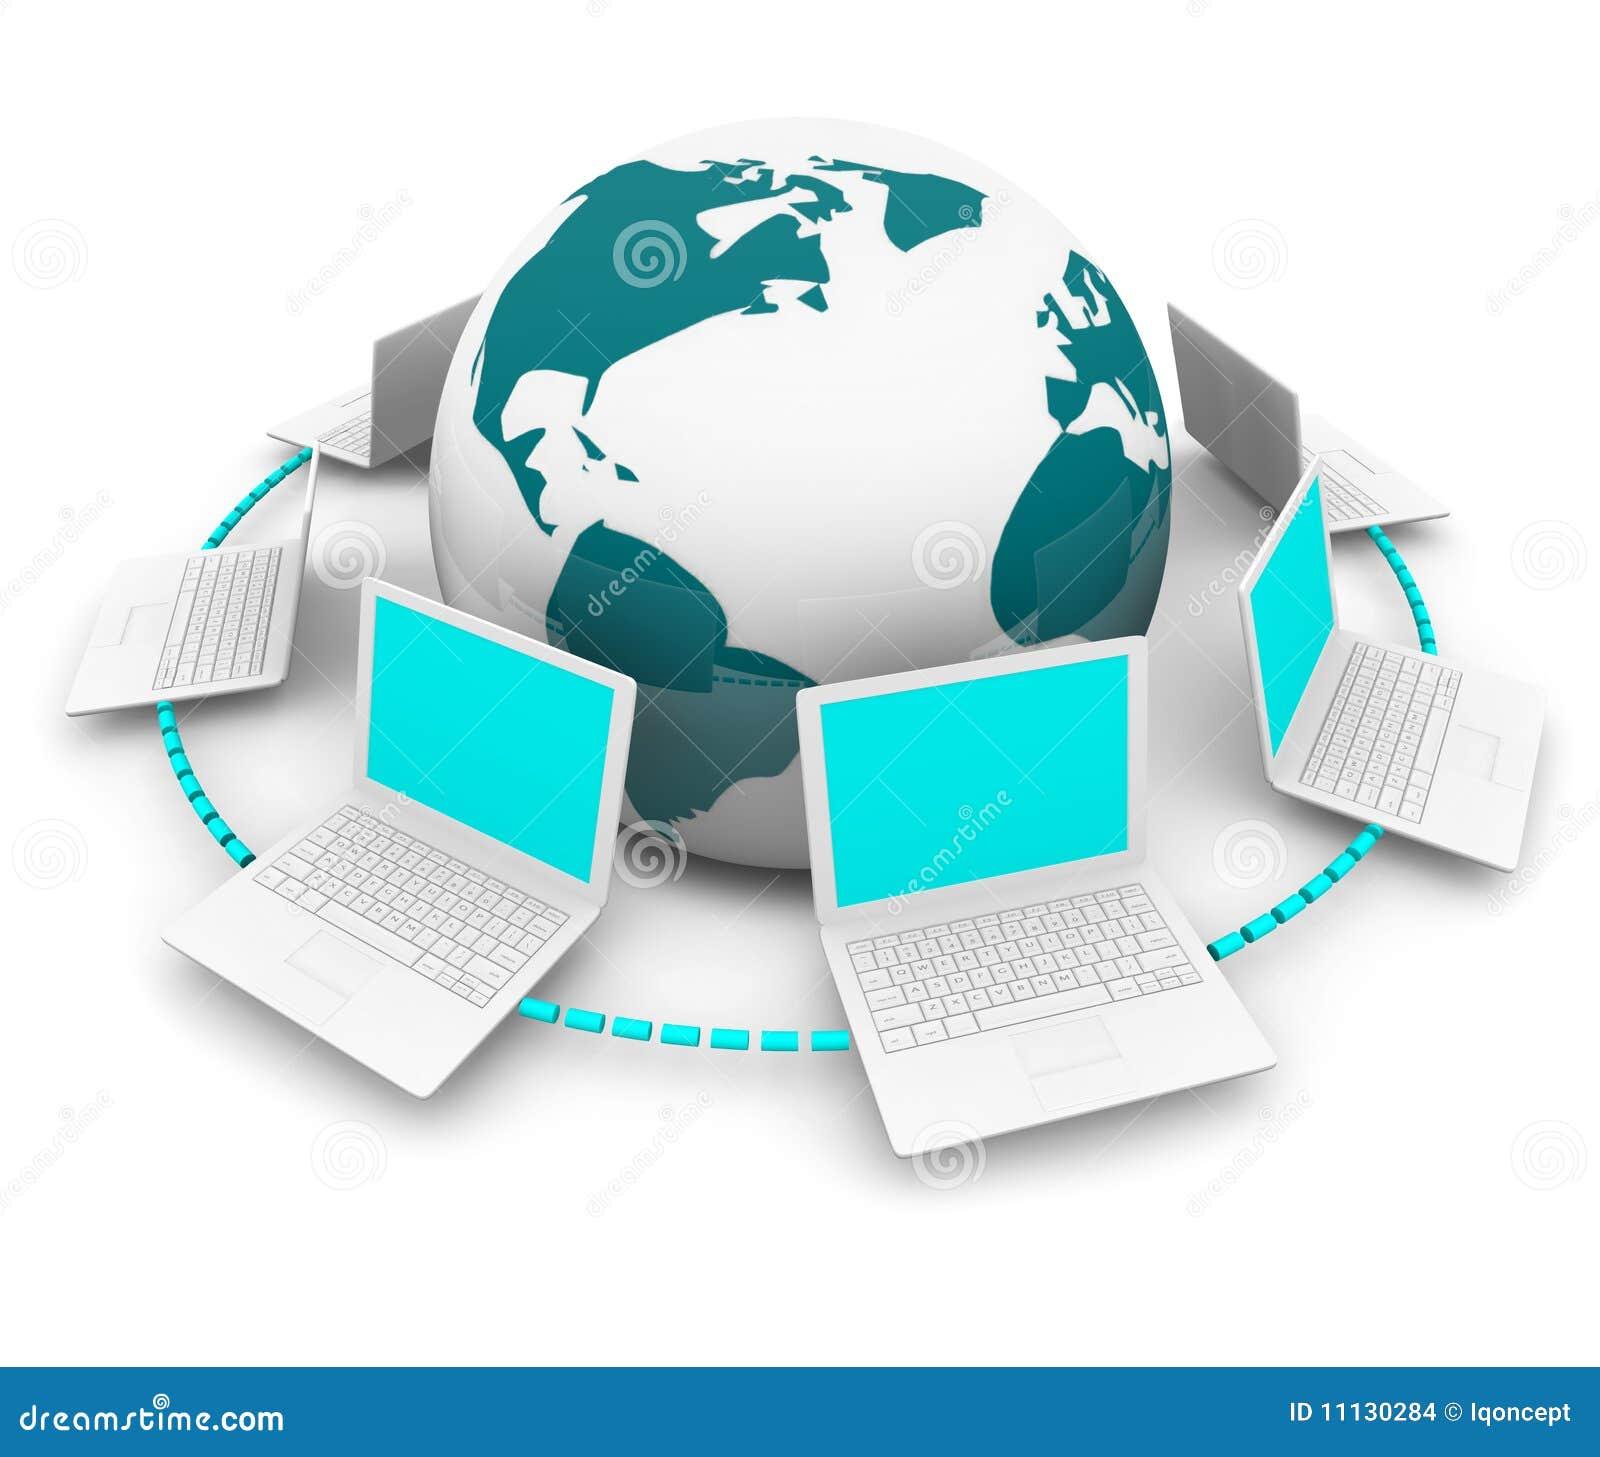 Red global de computadoras port tiles alrededor de la - Fotos de ordenadores ...